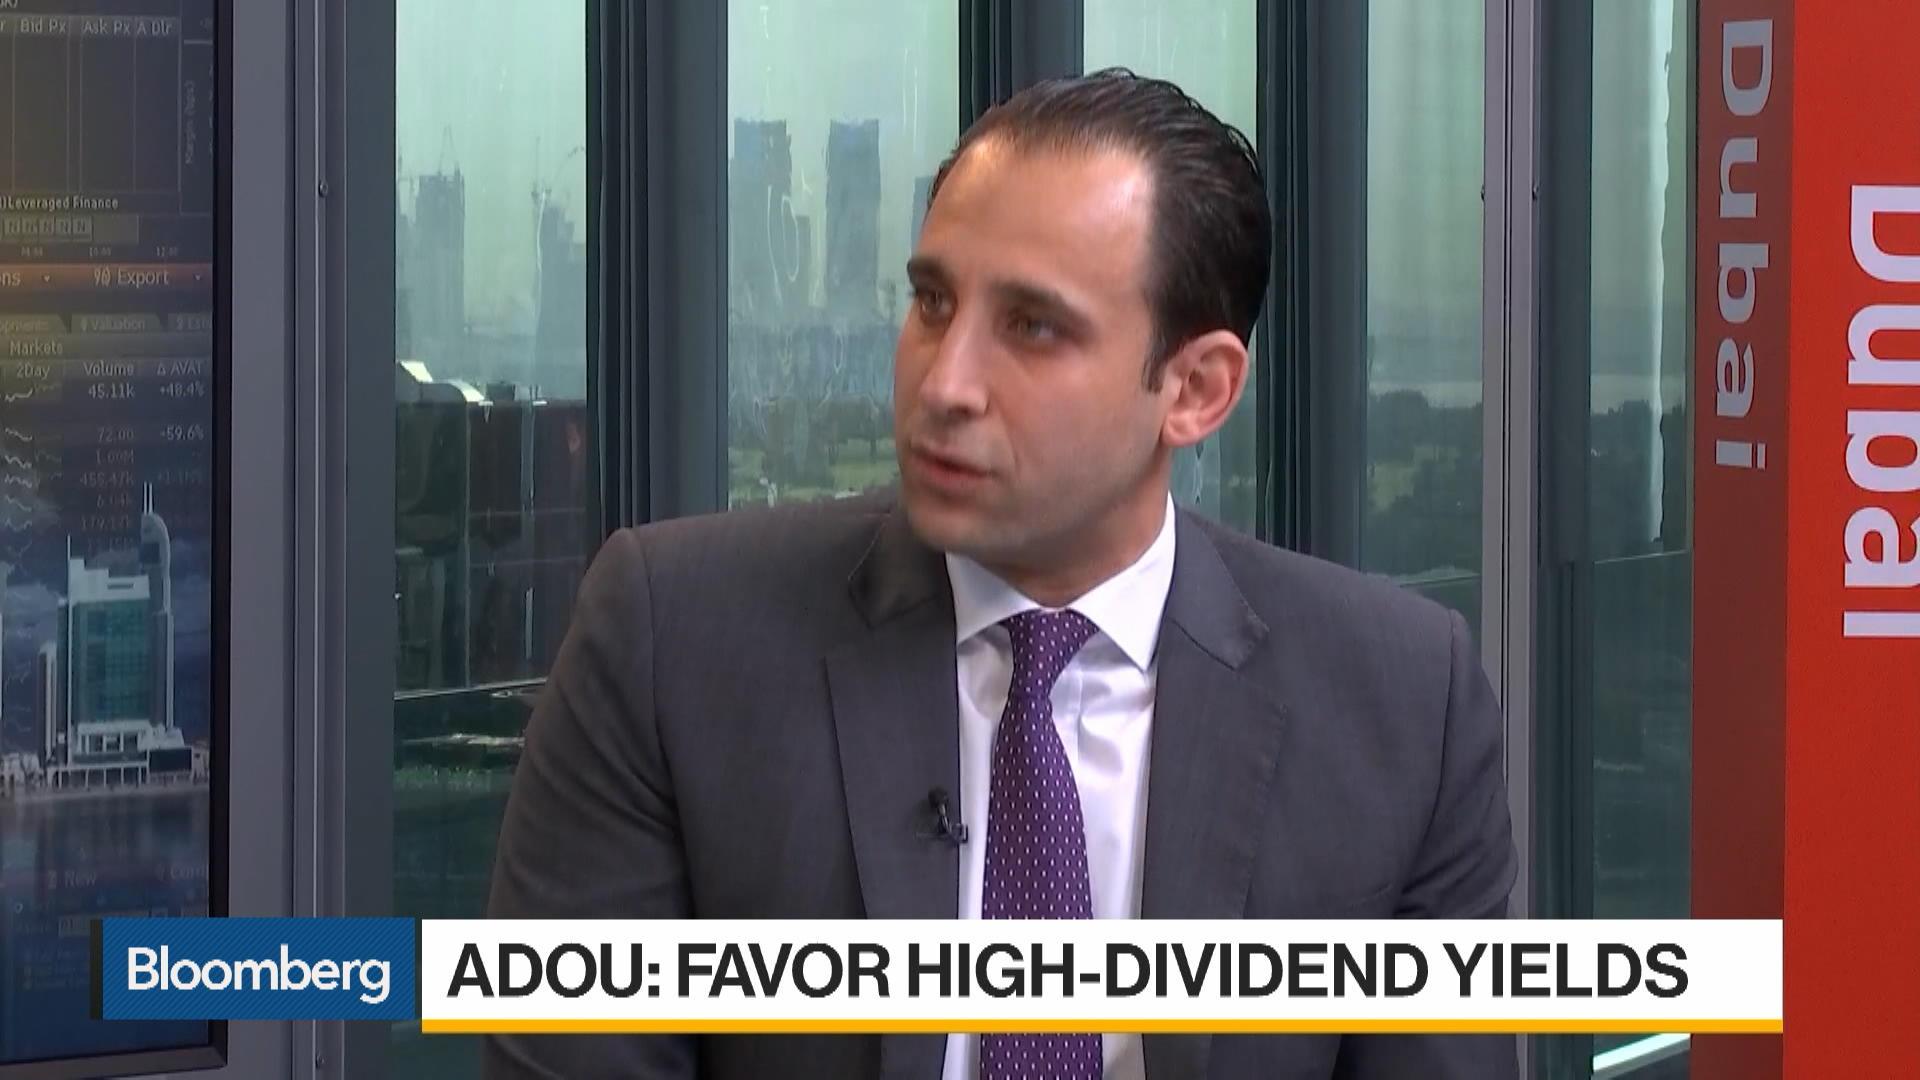 Lebanon Needs Reforms to Exit Debt Crisis, Says Ali El Adou of Daman Investments